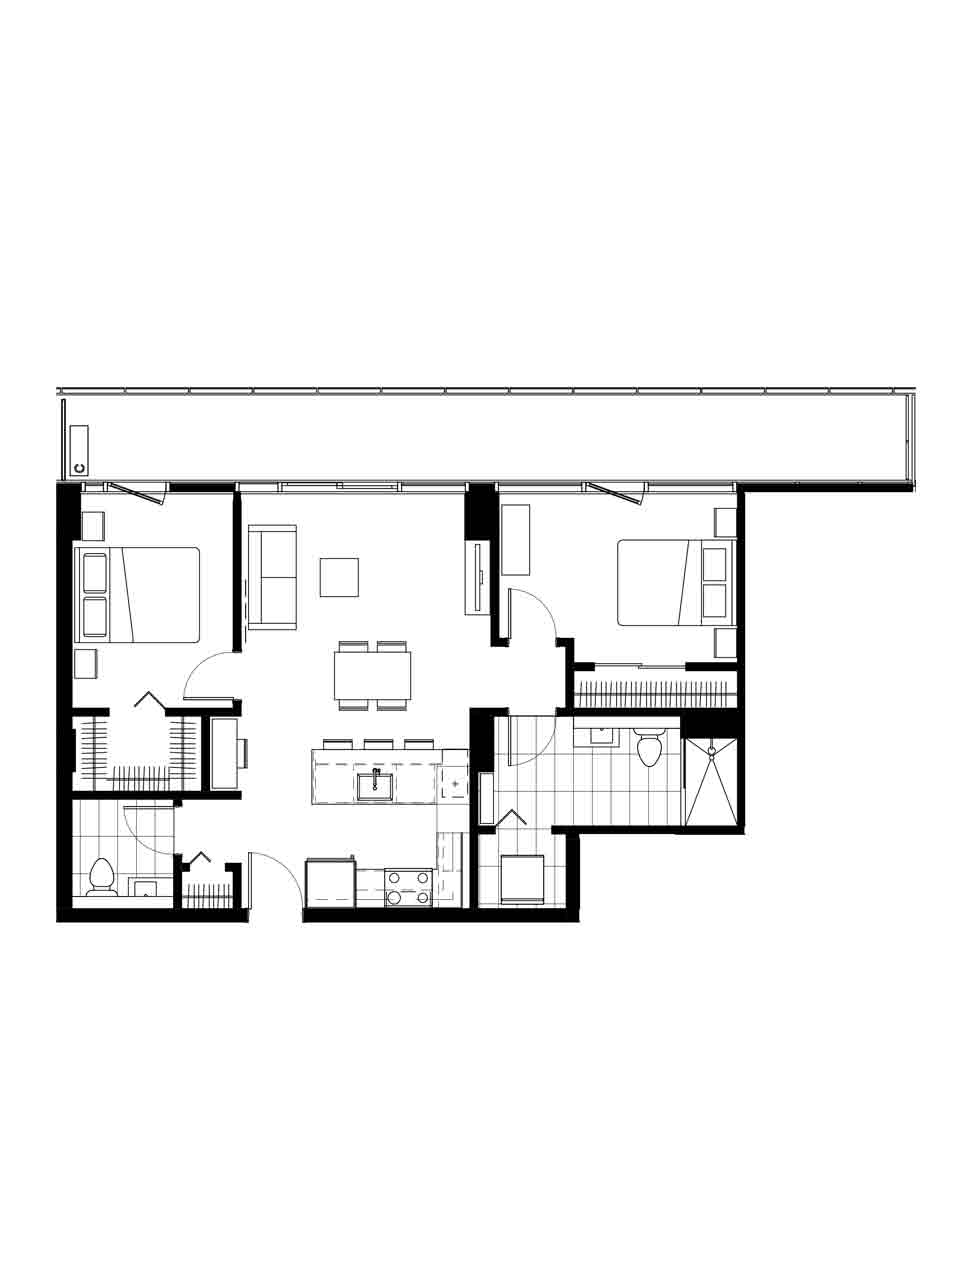 Plan condo modele M.2.1